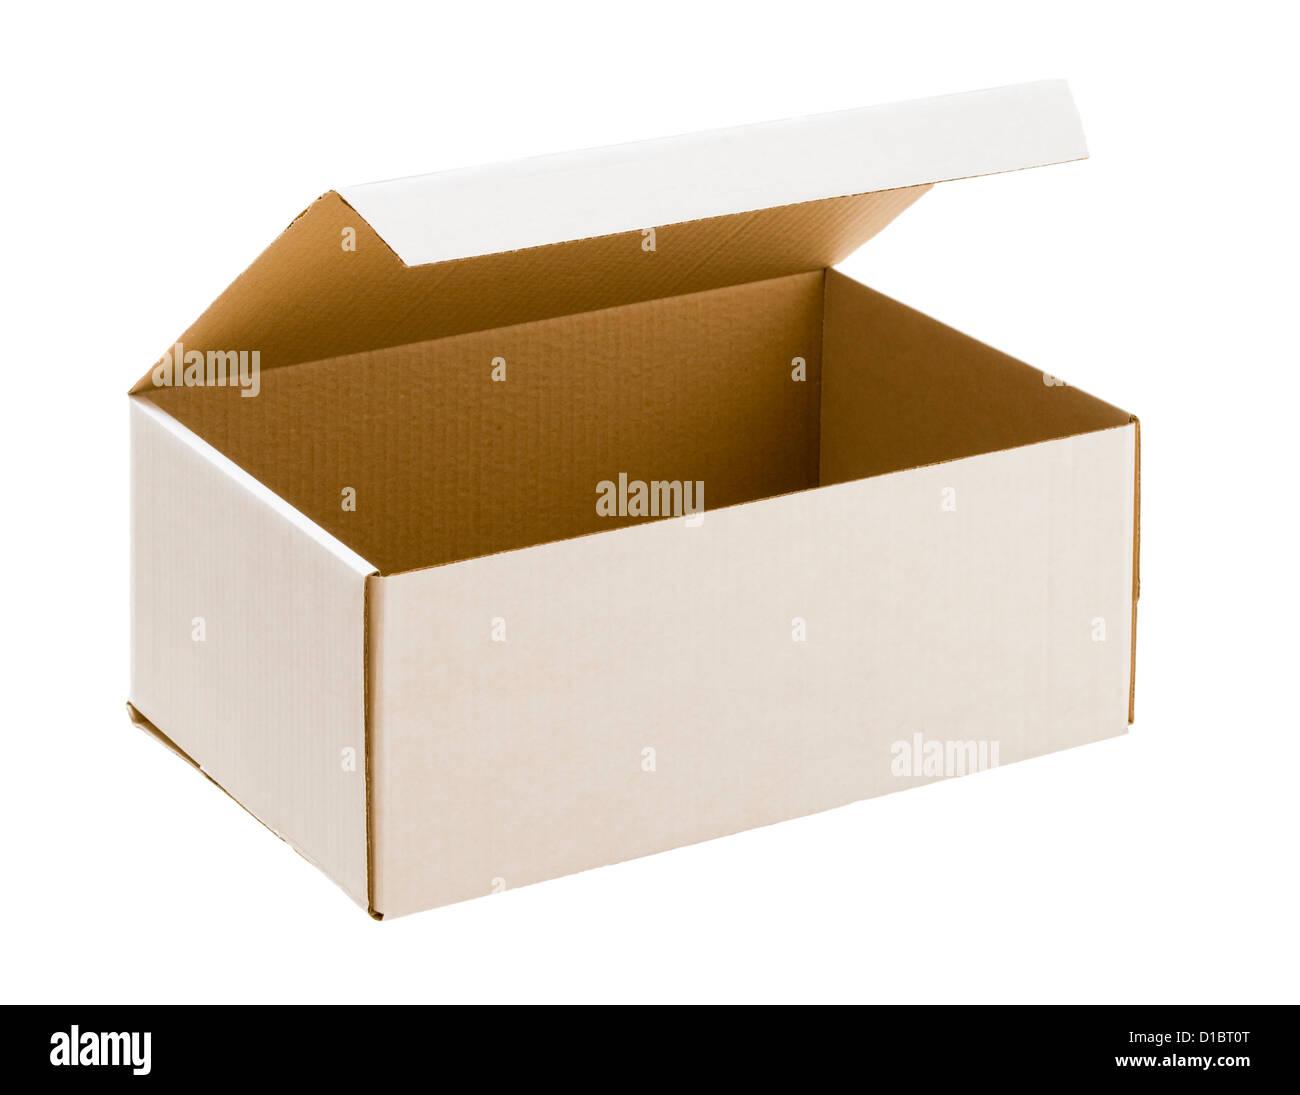 Empty cardboard box. - Stock Image